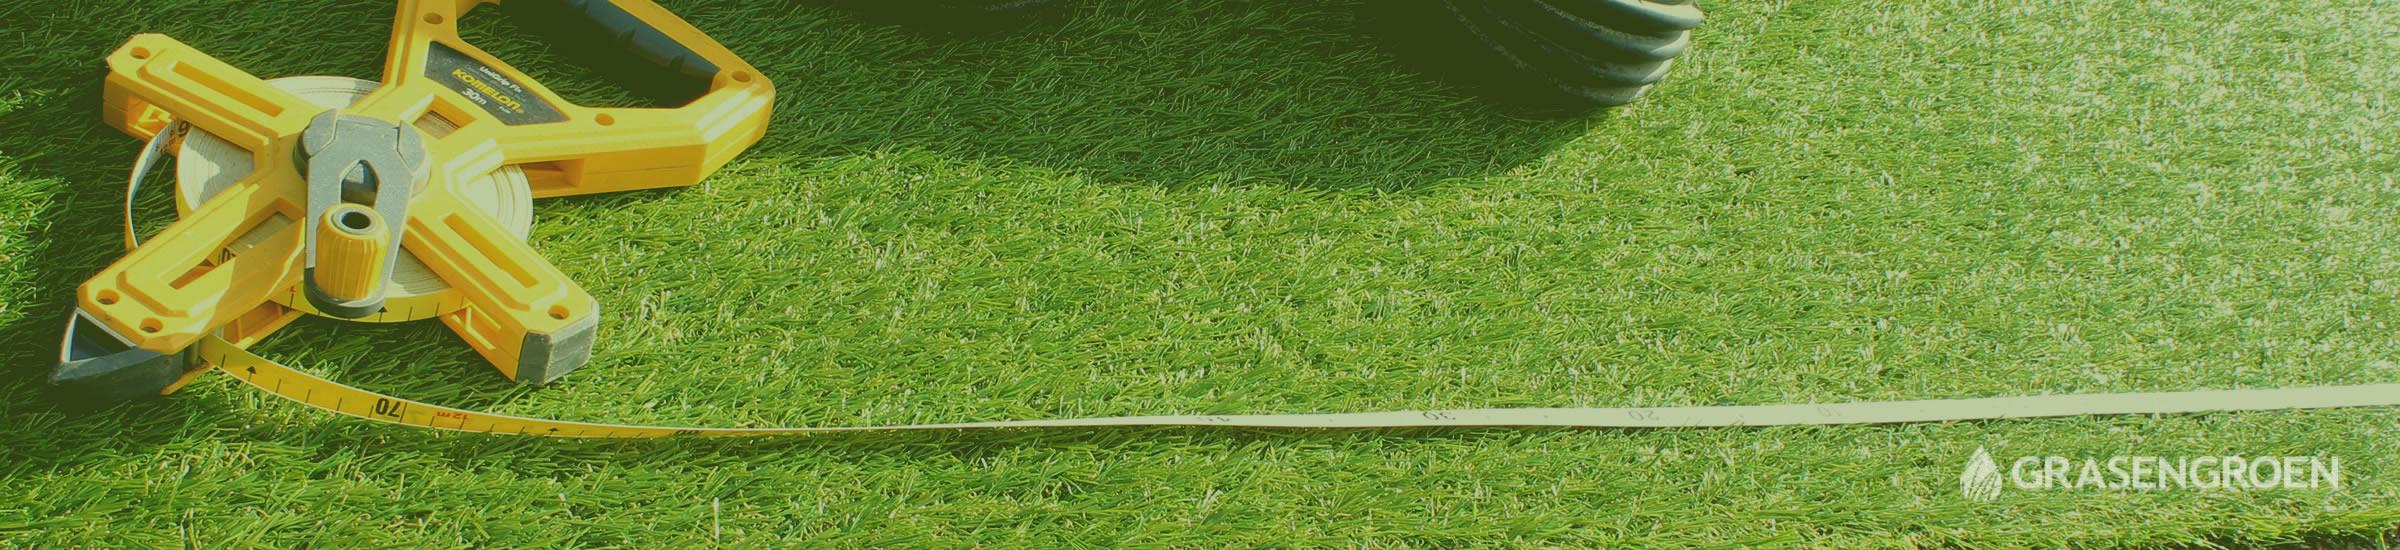 Kunstgrasinmeten • Gras en Groen Kunstgras